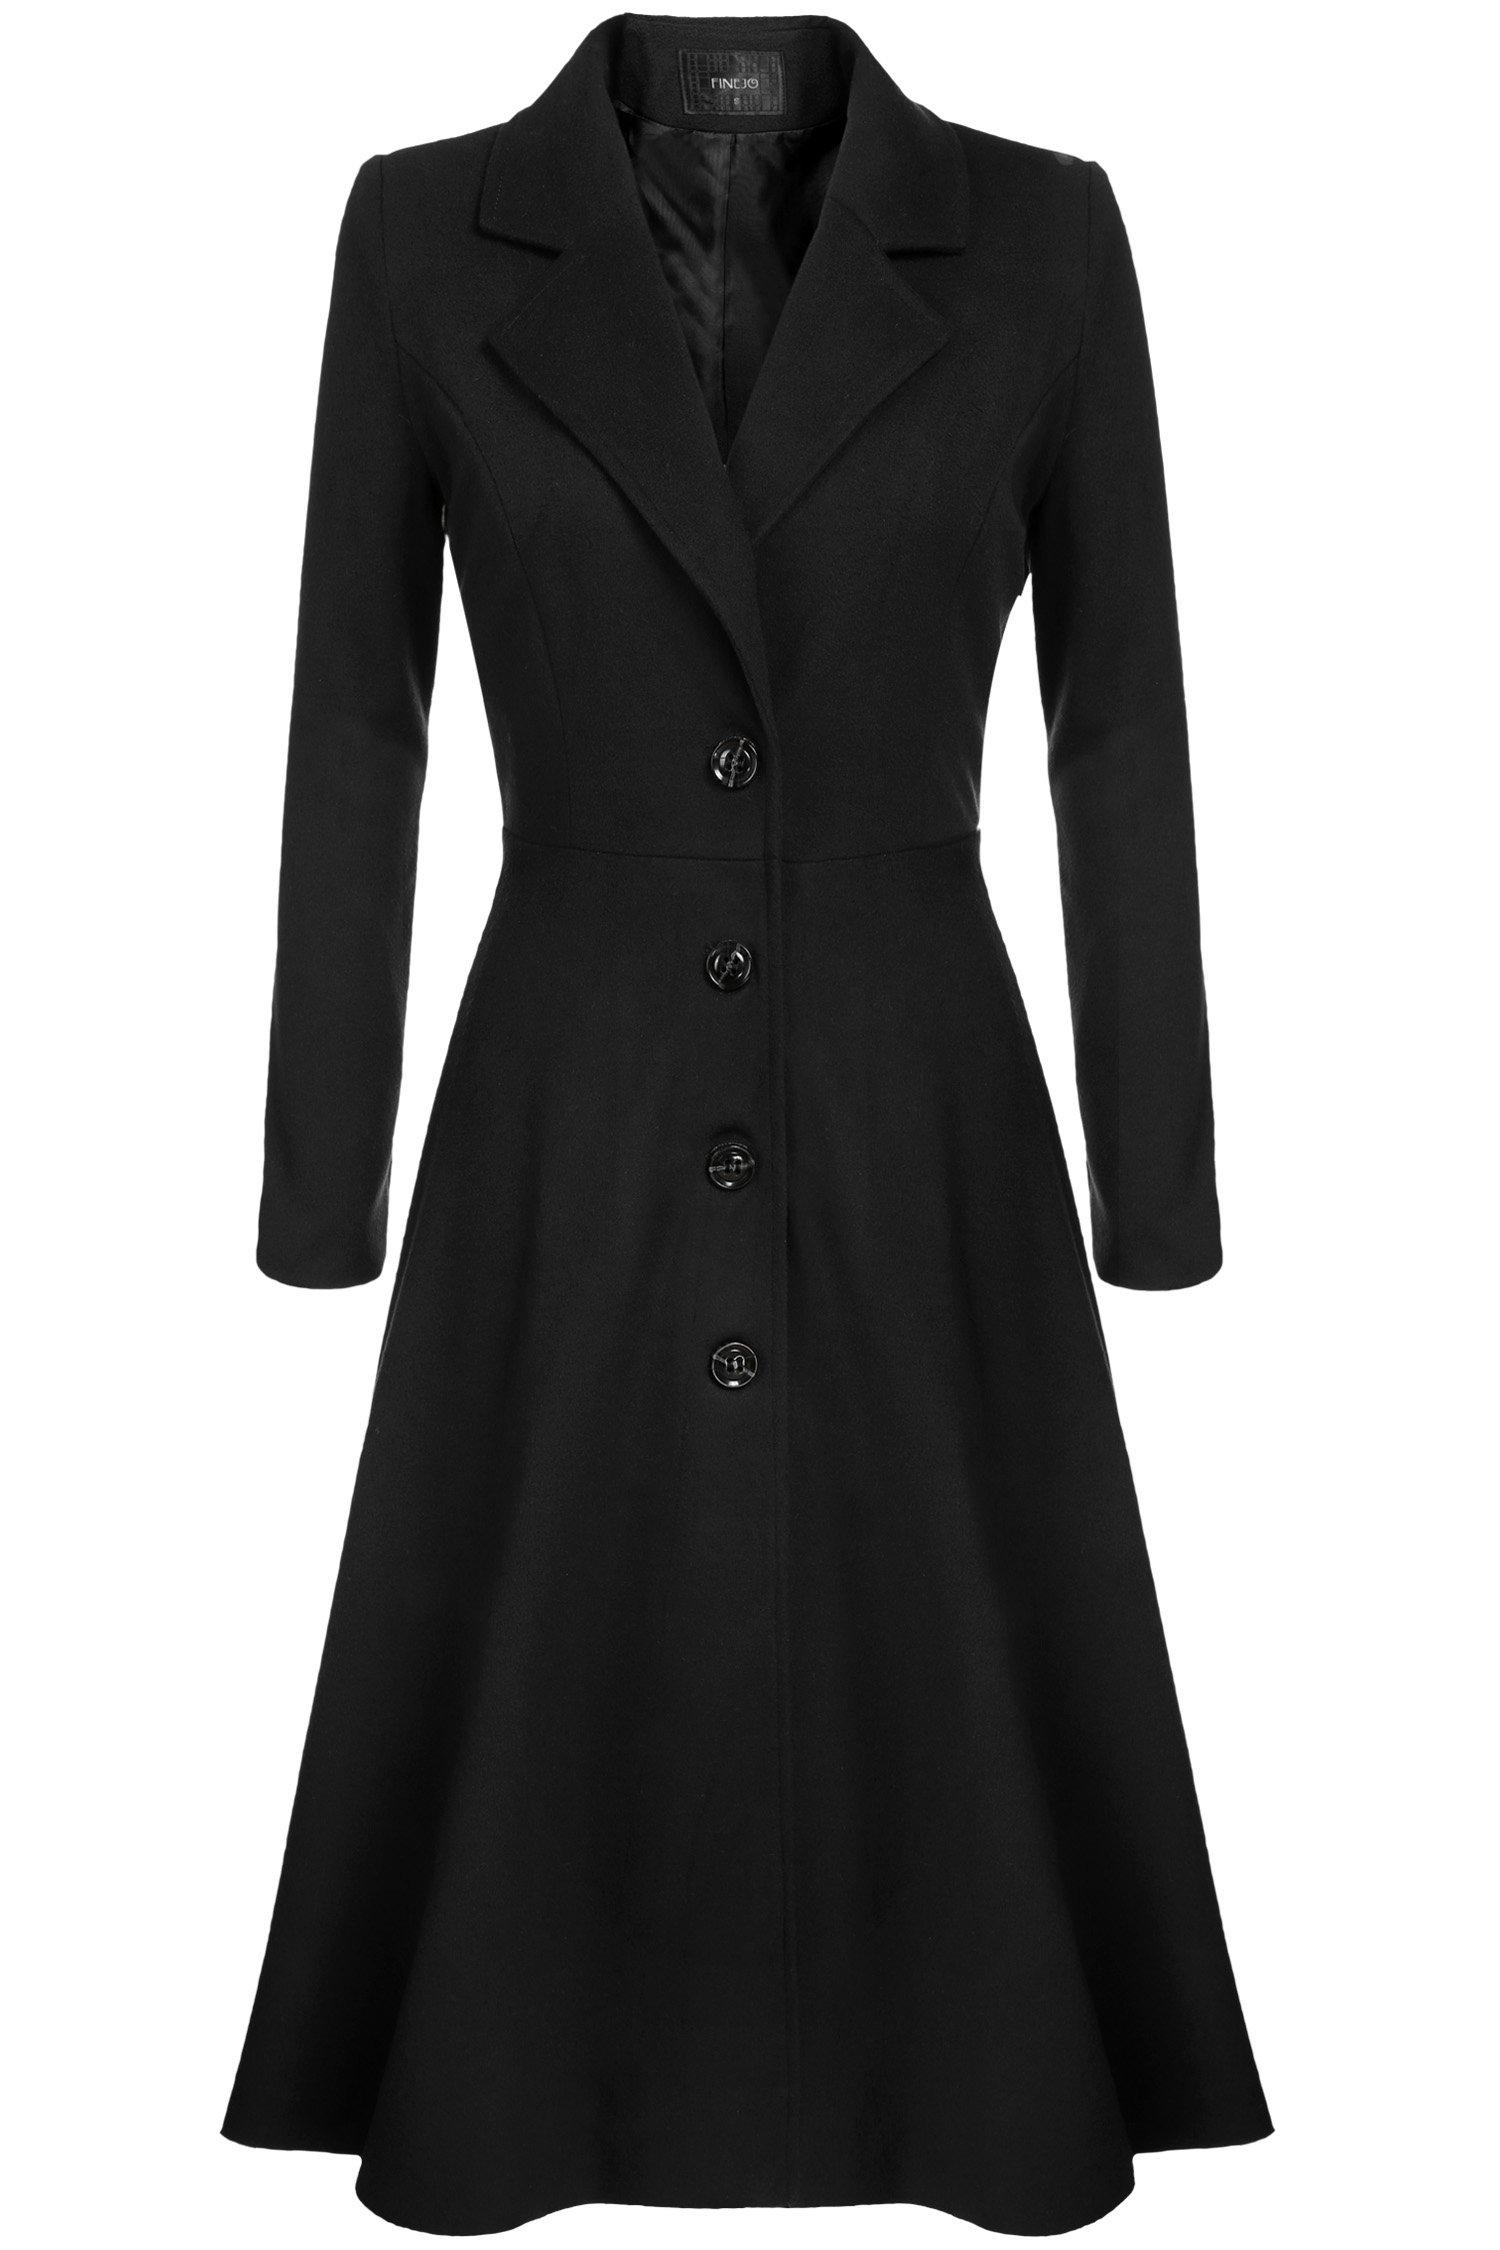 Kize Women Single Breasted Plus Size Long Trench Overcoat - XX-Large - Black